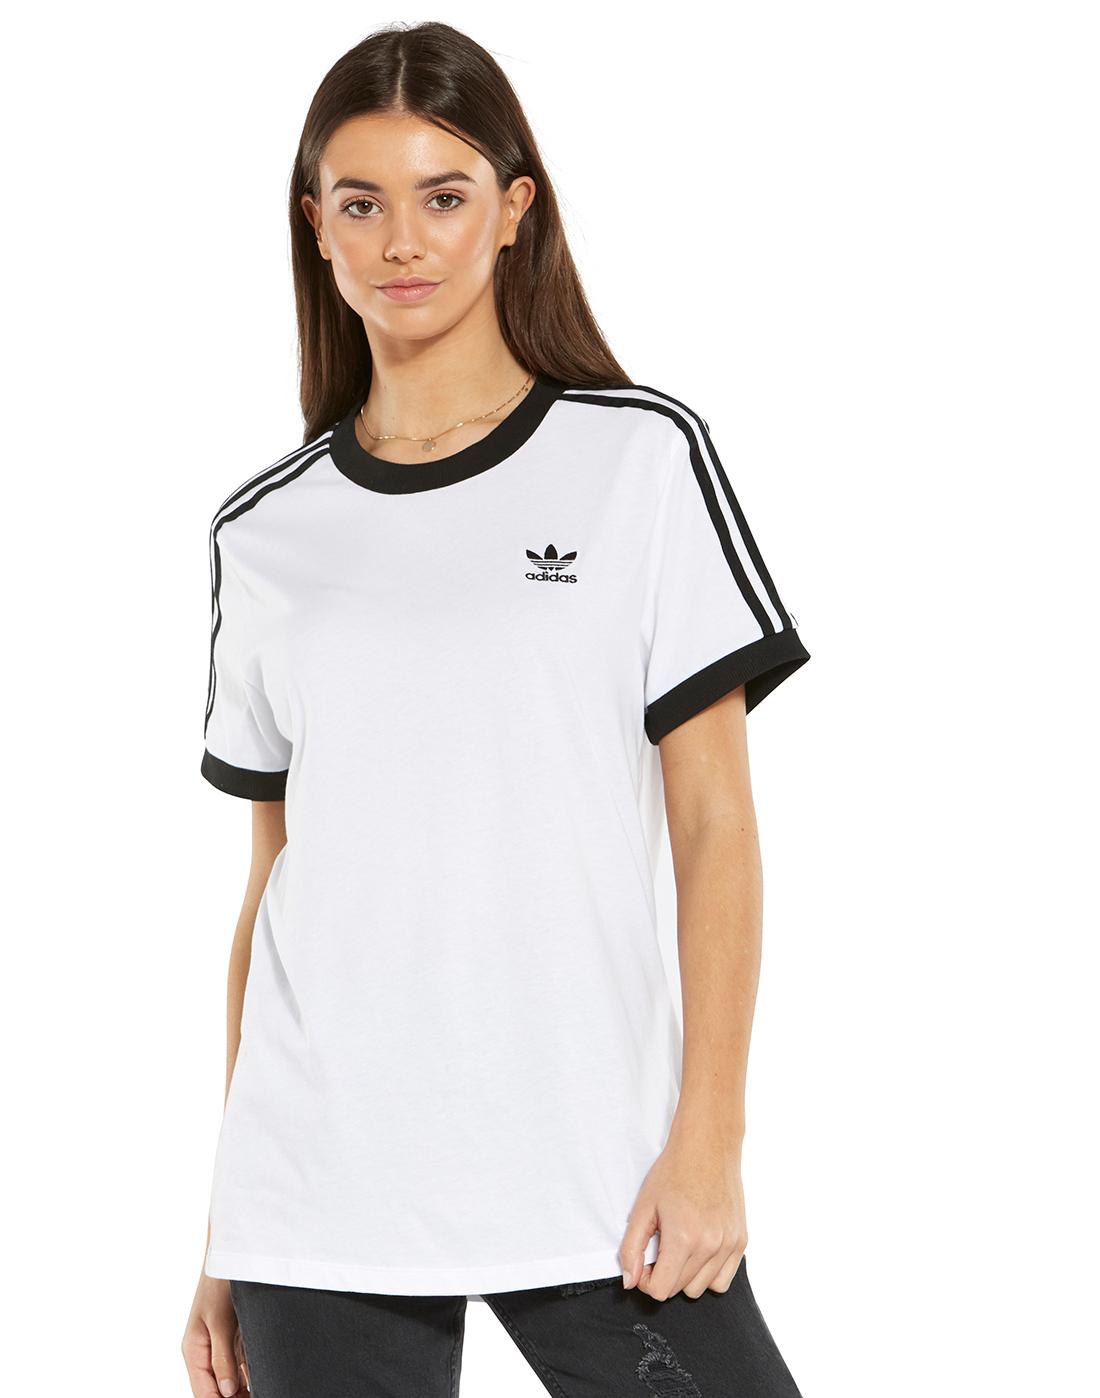 2acacc84ea Women's White & Black adidas Originals 3-Stripe T-Shirt | Life Style ...